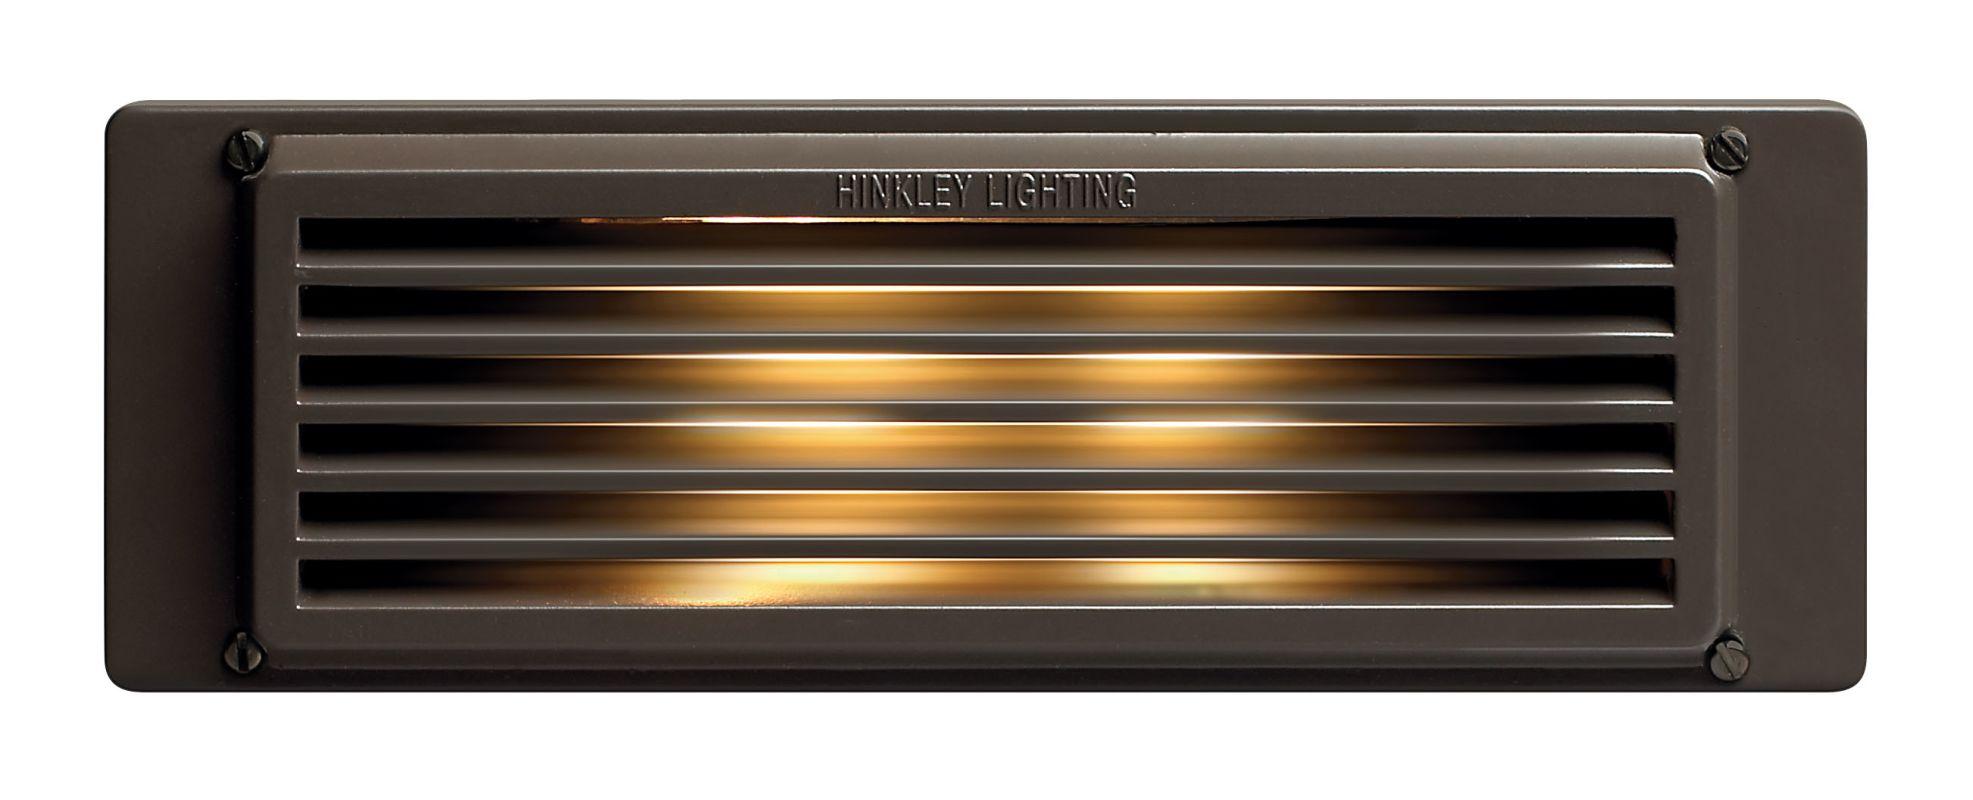 Hinkley Lighting 59040bz Bronze 120v 40w Halogen Line